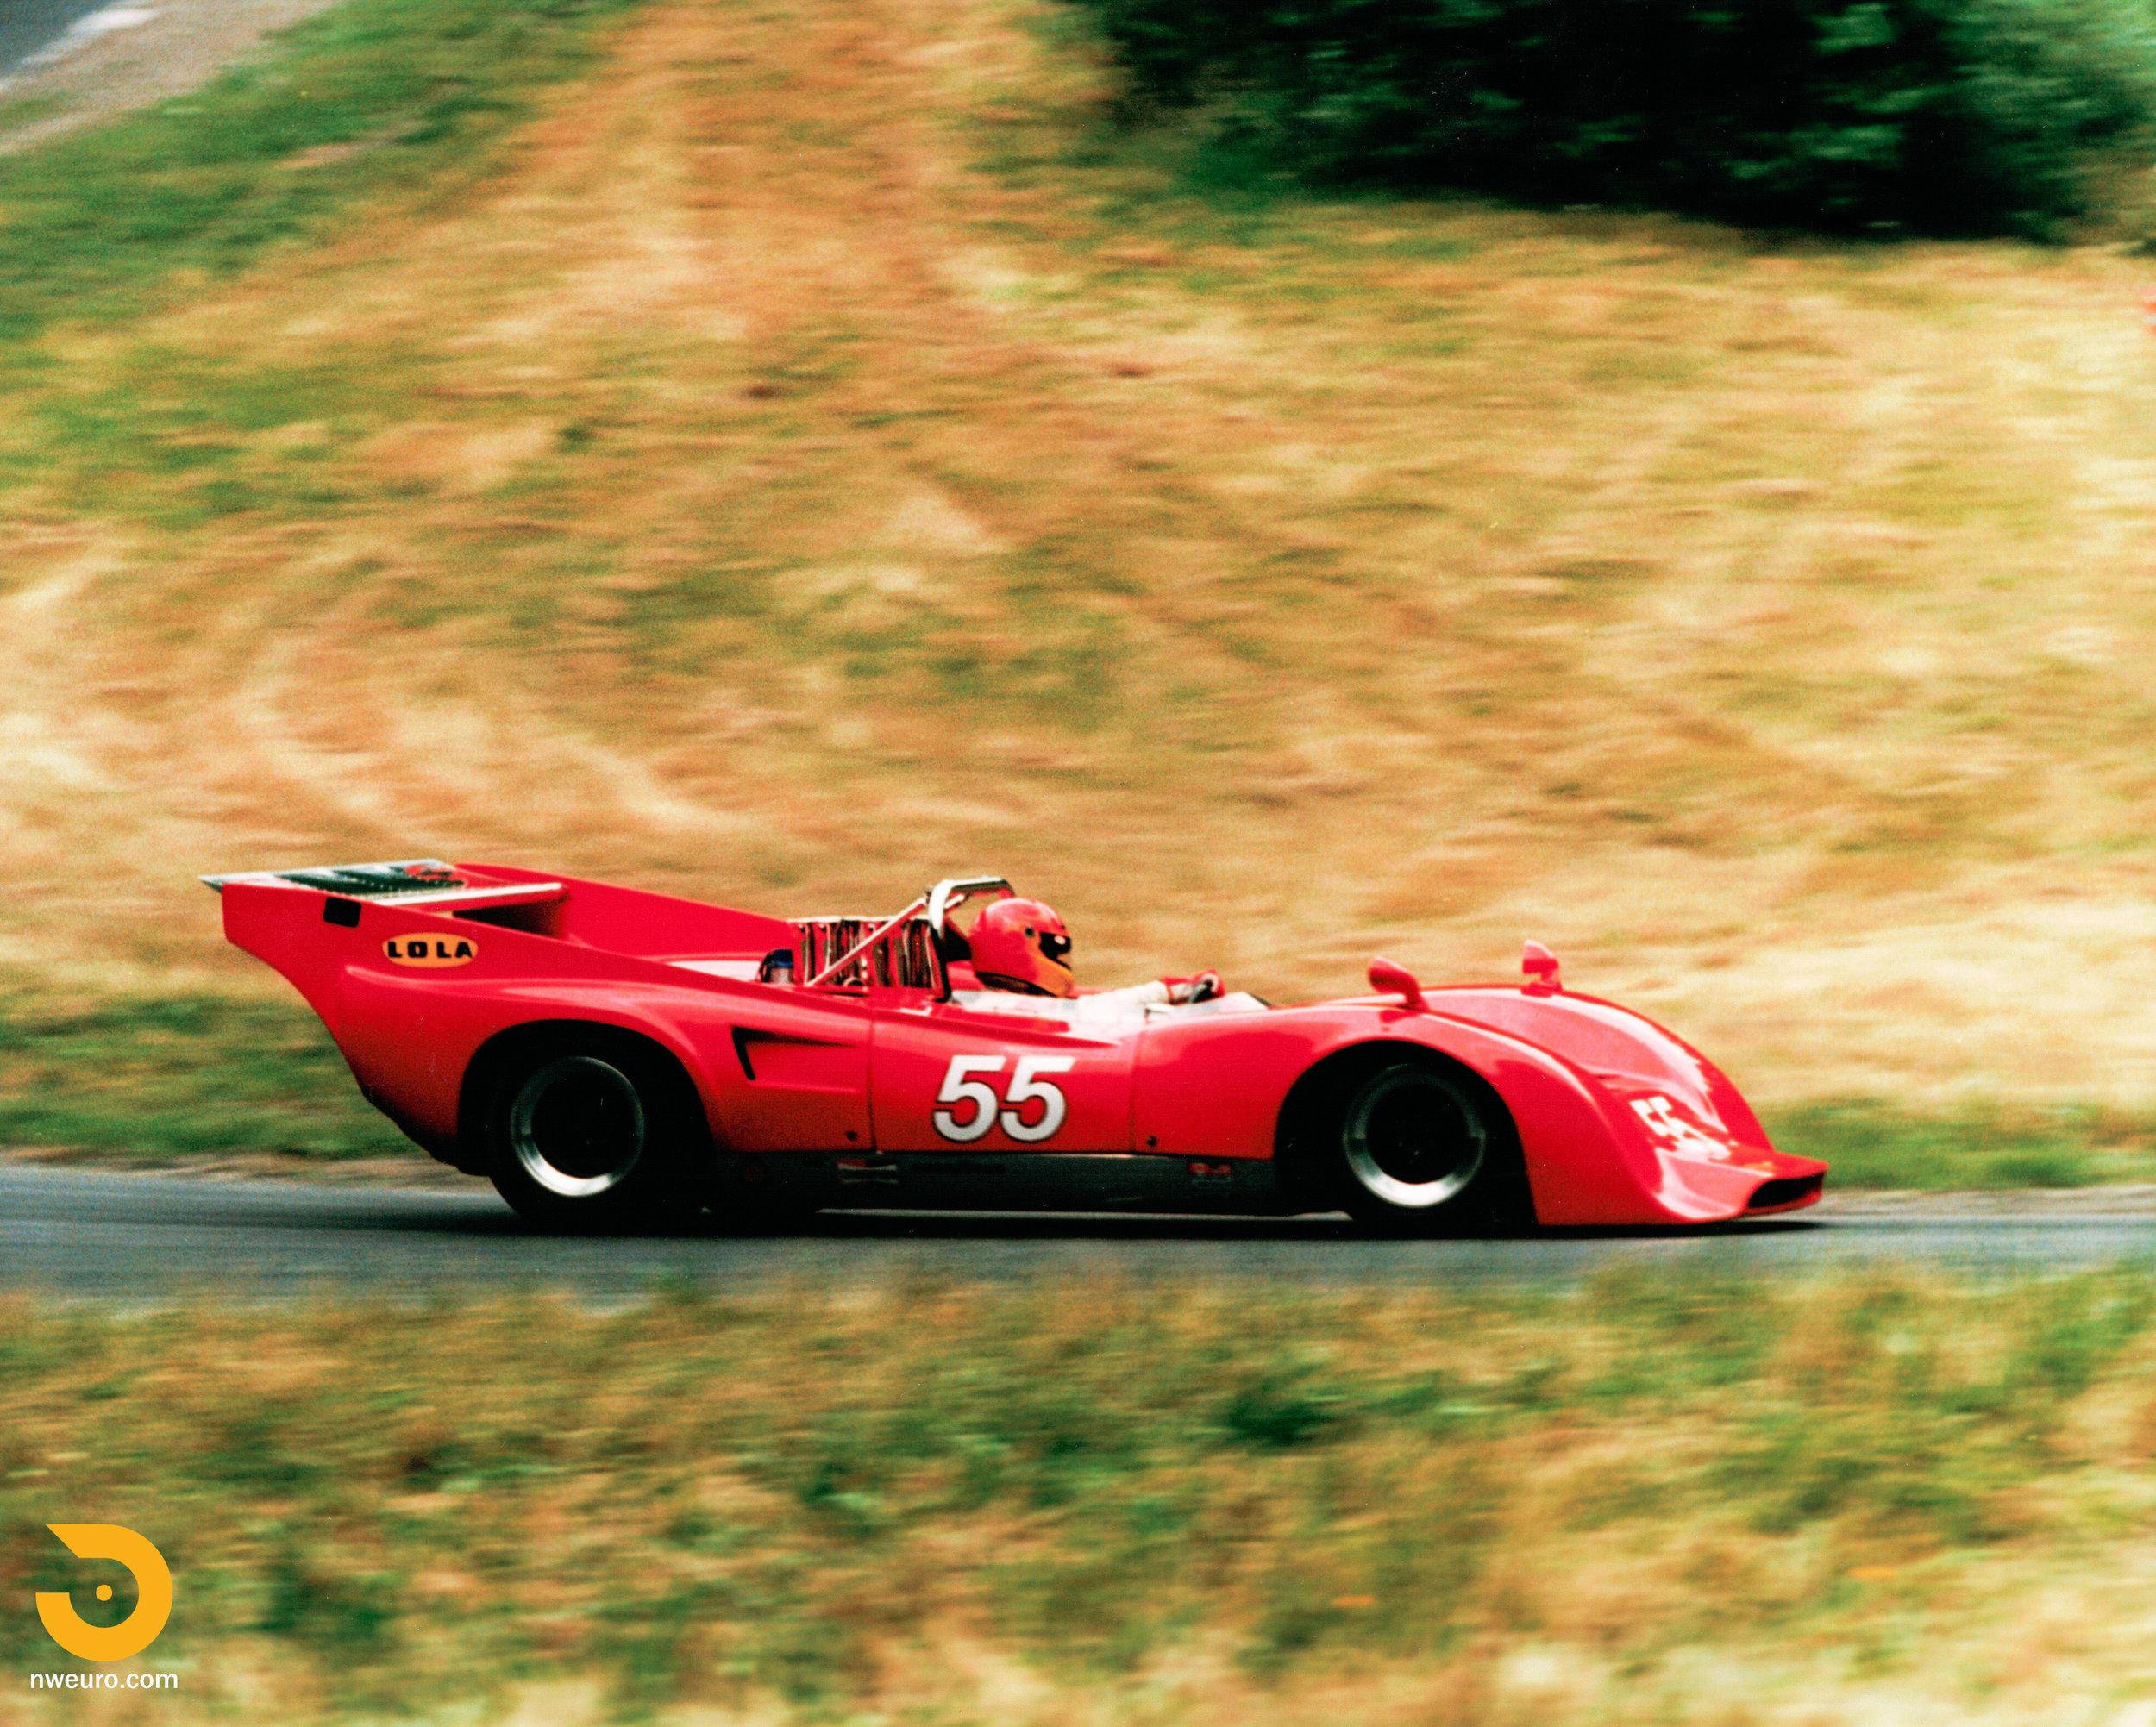 1969 Lola T162 Can-Am Race Car Action Shots-4.jpg